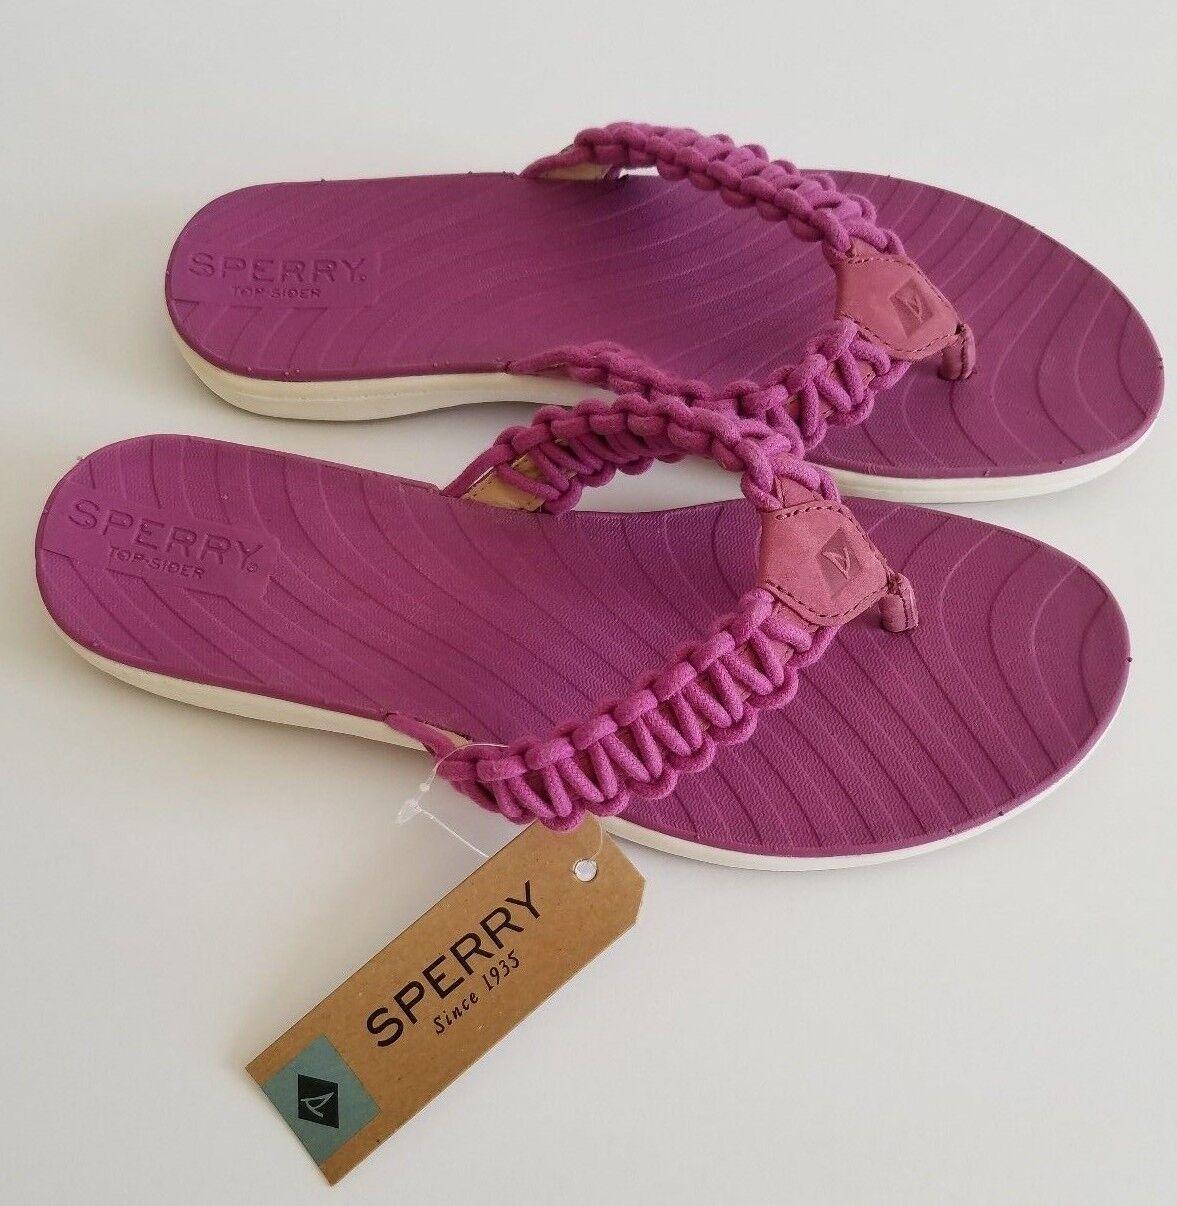 Damiani's Cushioned Wedge Slide Sandals Black Size 12